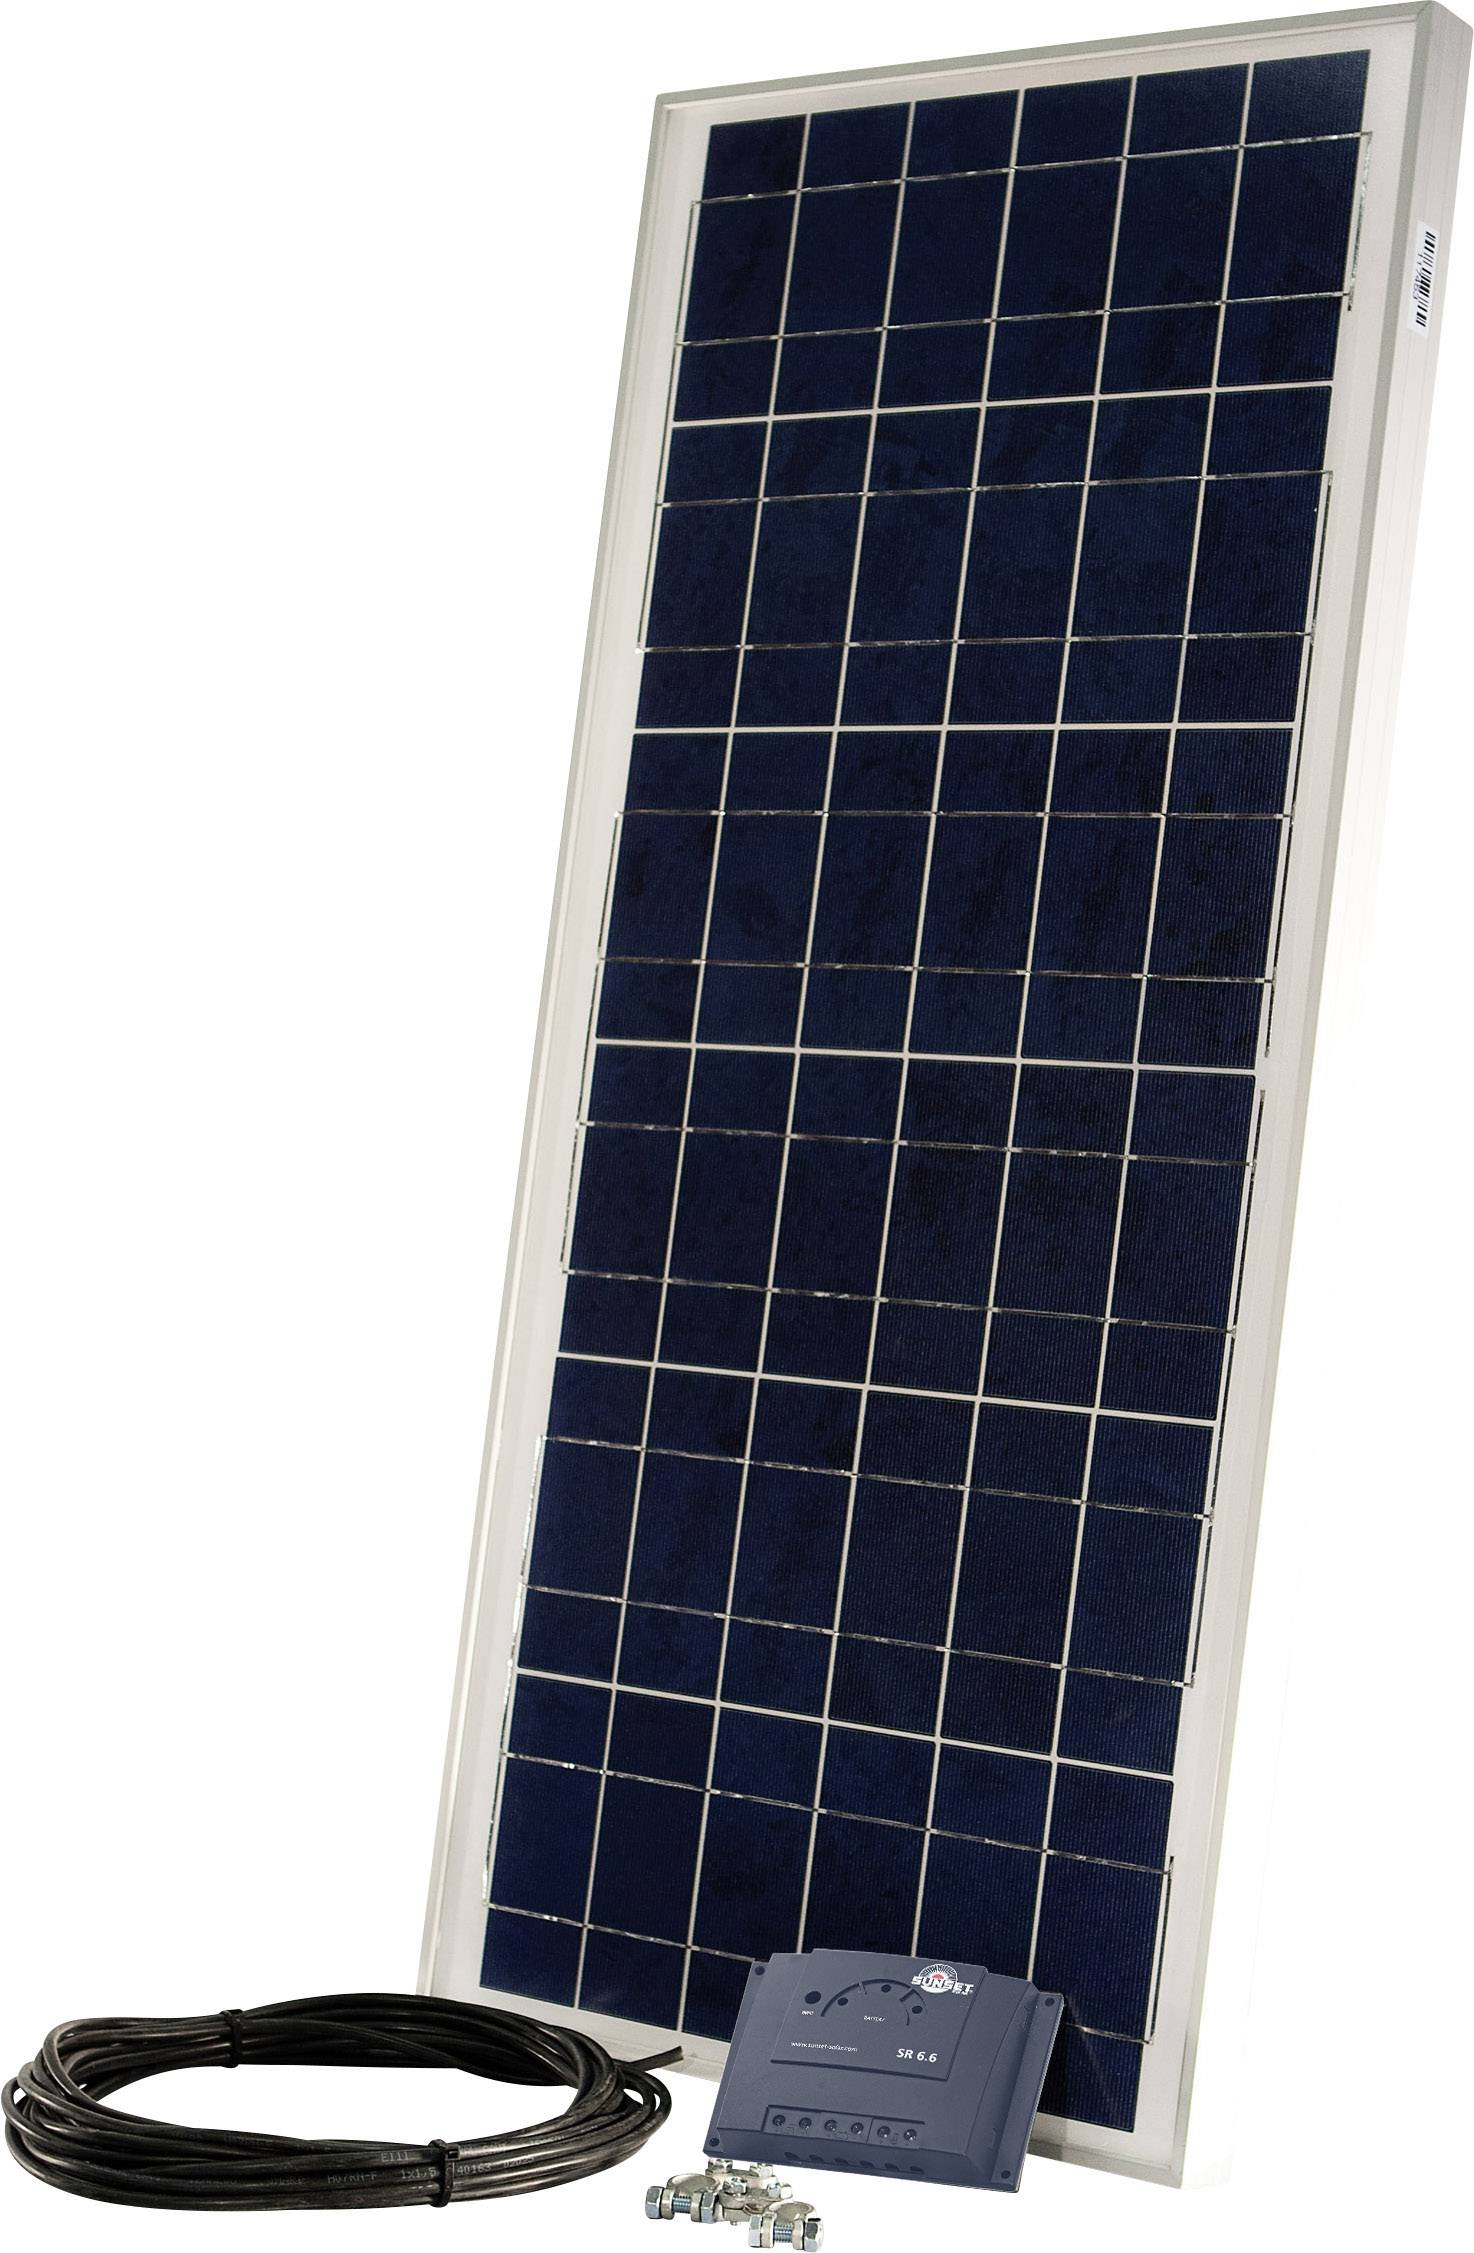 Solárna sada Sunset PX 55 110270, 55 Wp, vr. kábla, vr. nabíjacieho regulátora